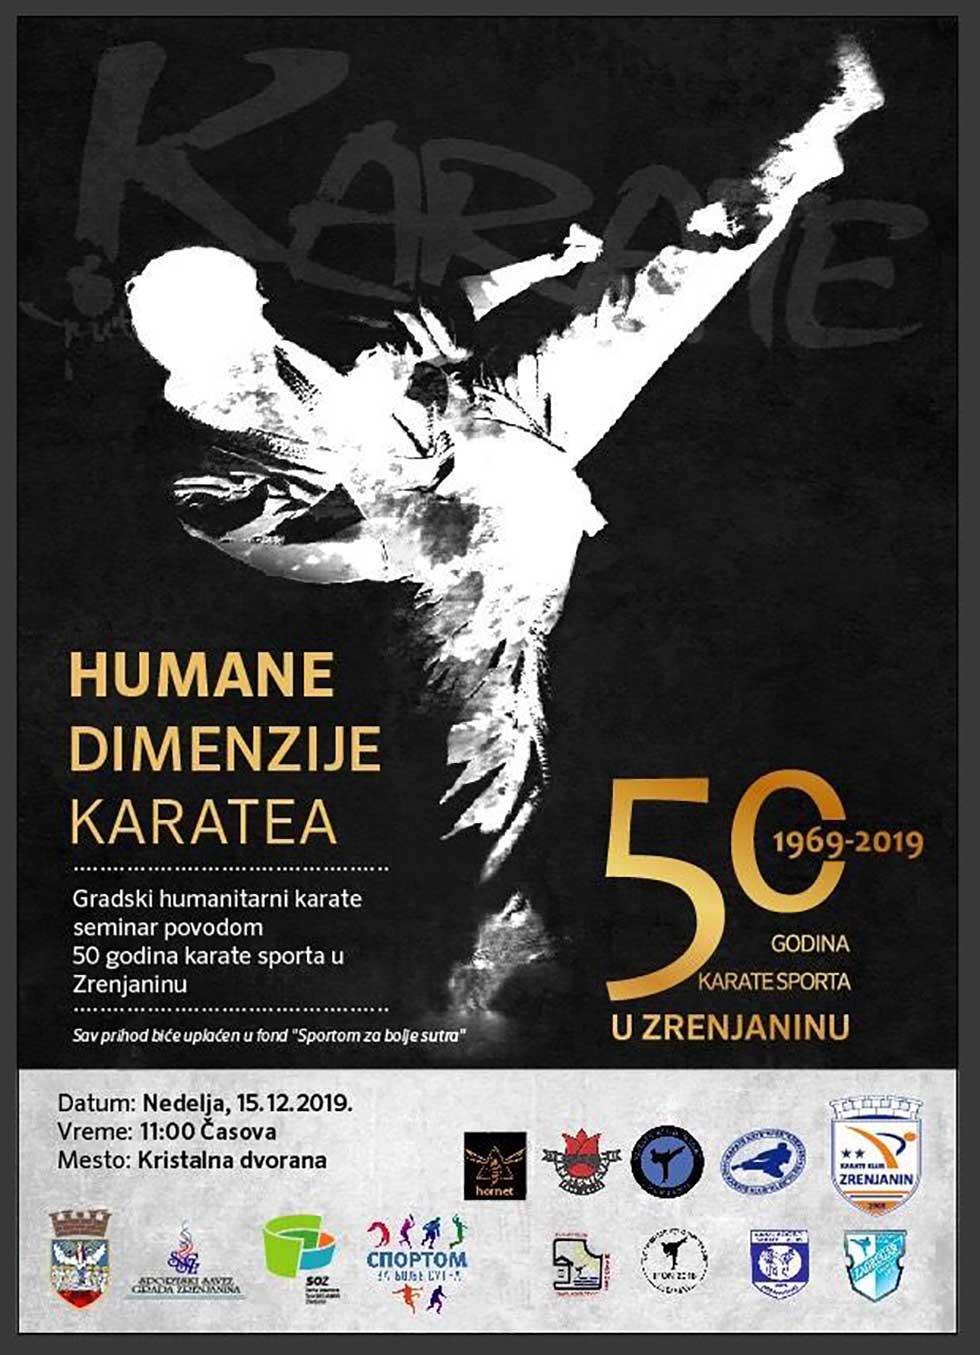 humane dimenzije karatea